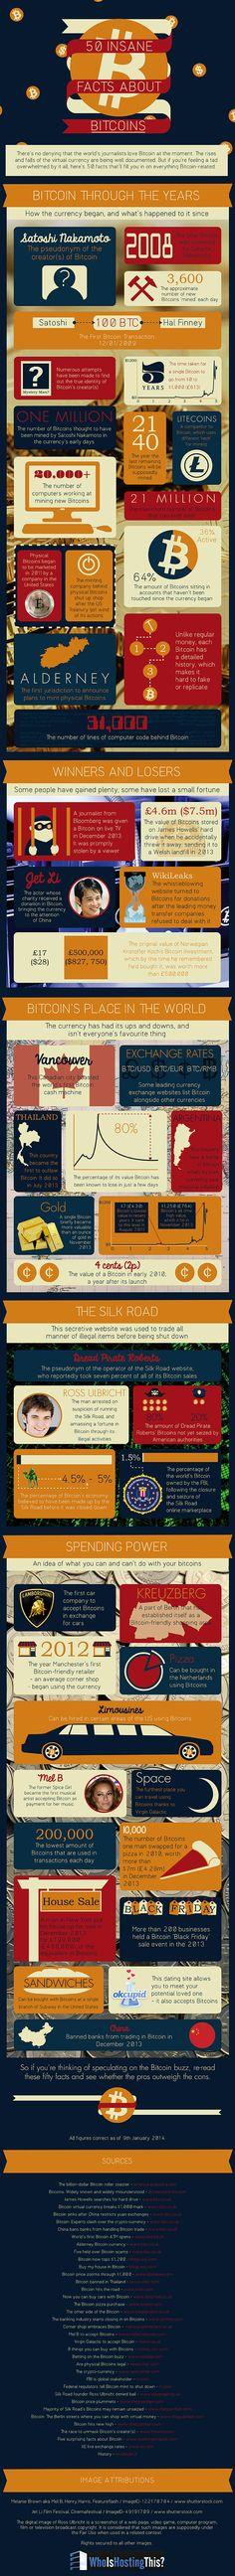 Afbeelding van http://assets.entrepreneur.com/article/1394042096-50-insane-facts-bitcoin-infographic.jpg.